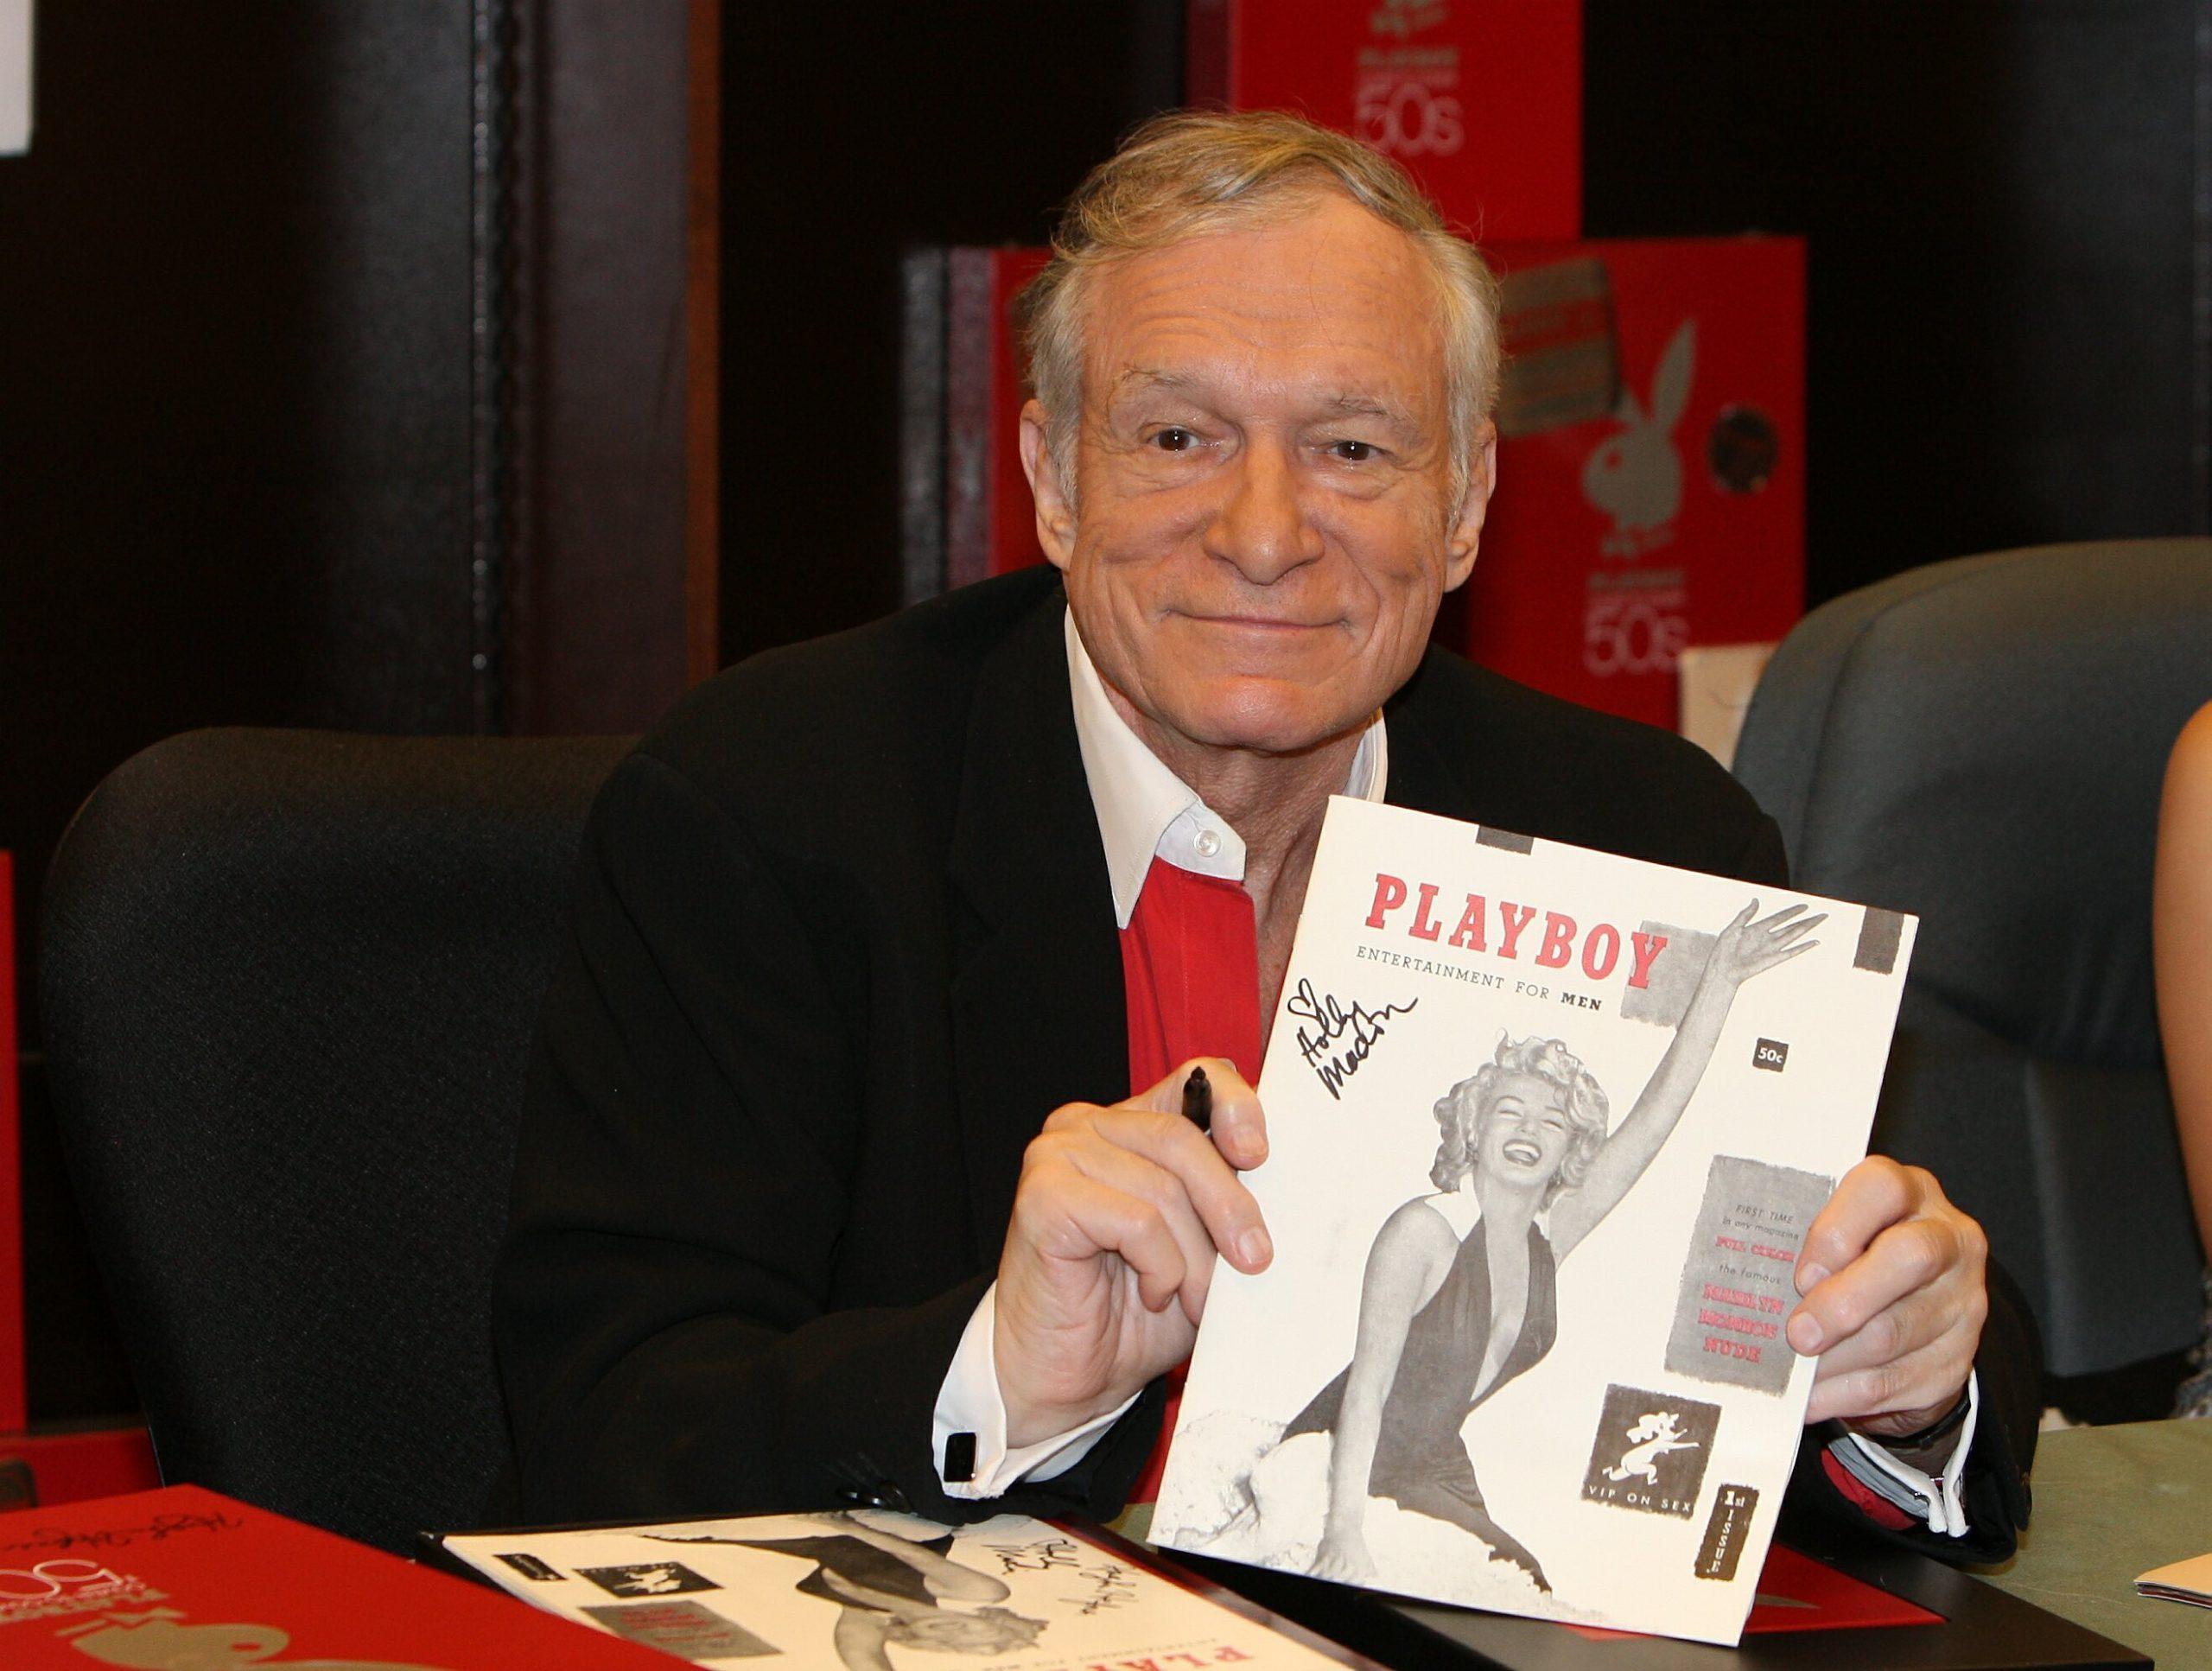 Elhunyt Hugh Hefner, a Playboy magazin alapítója